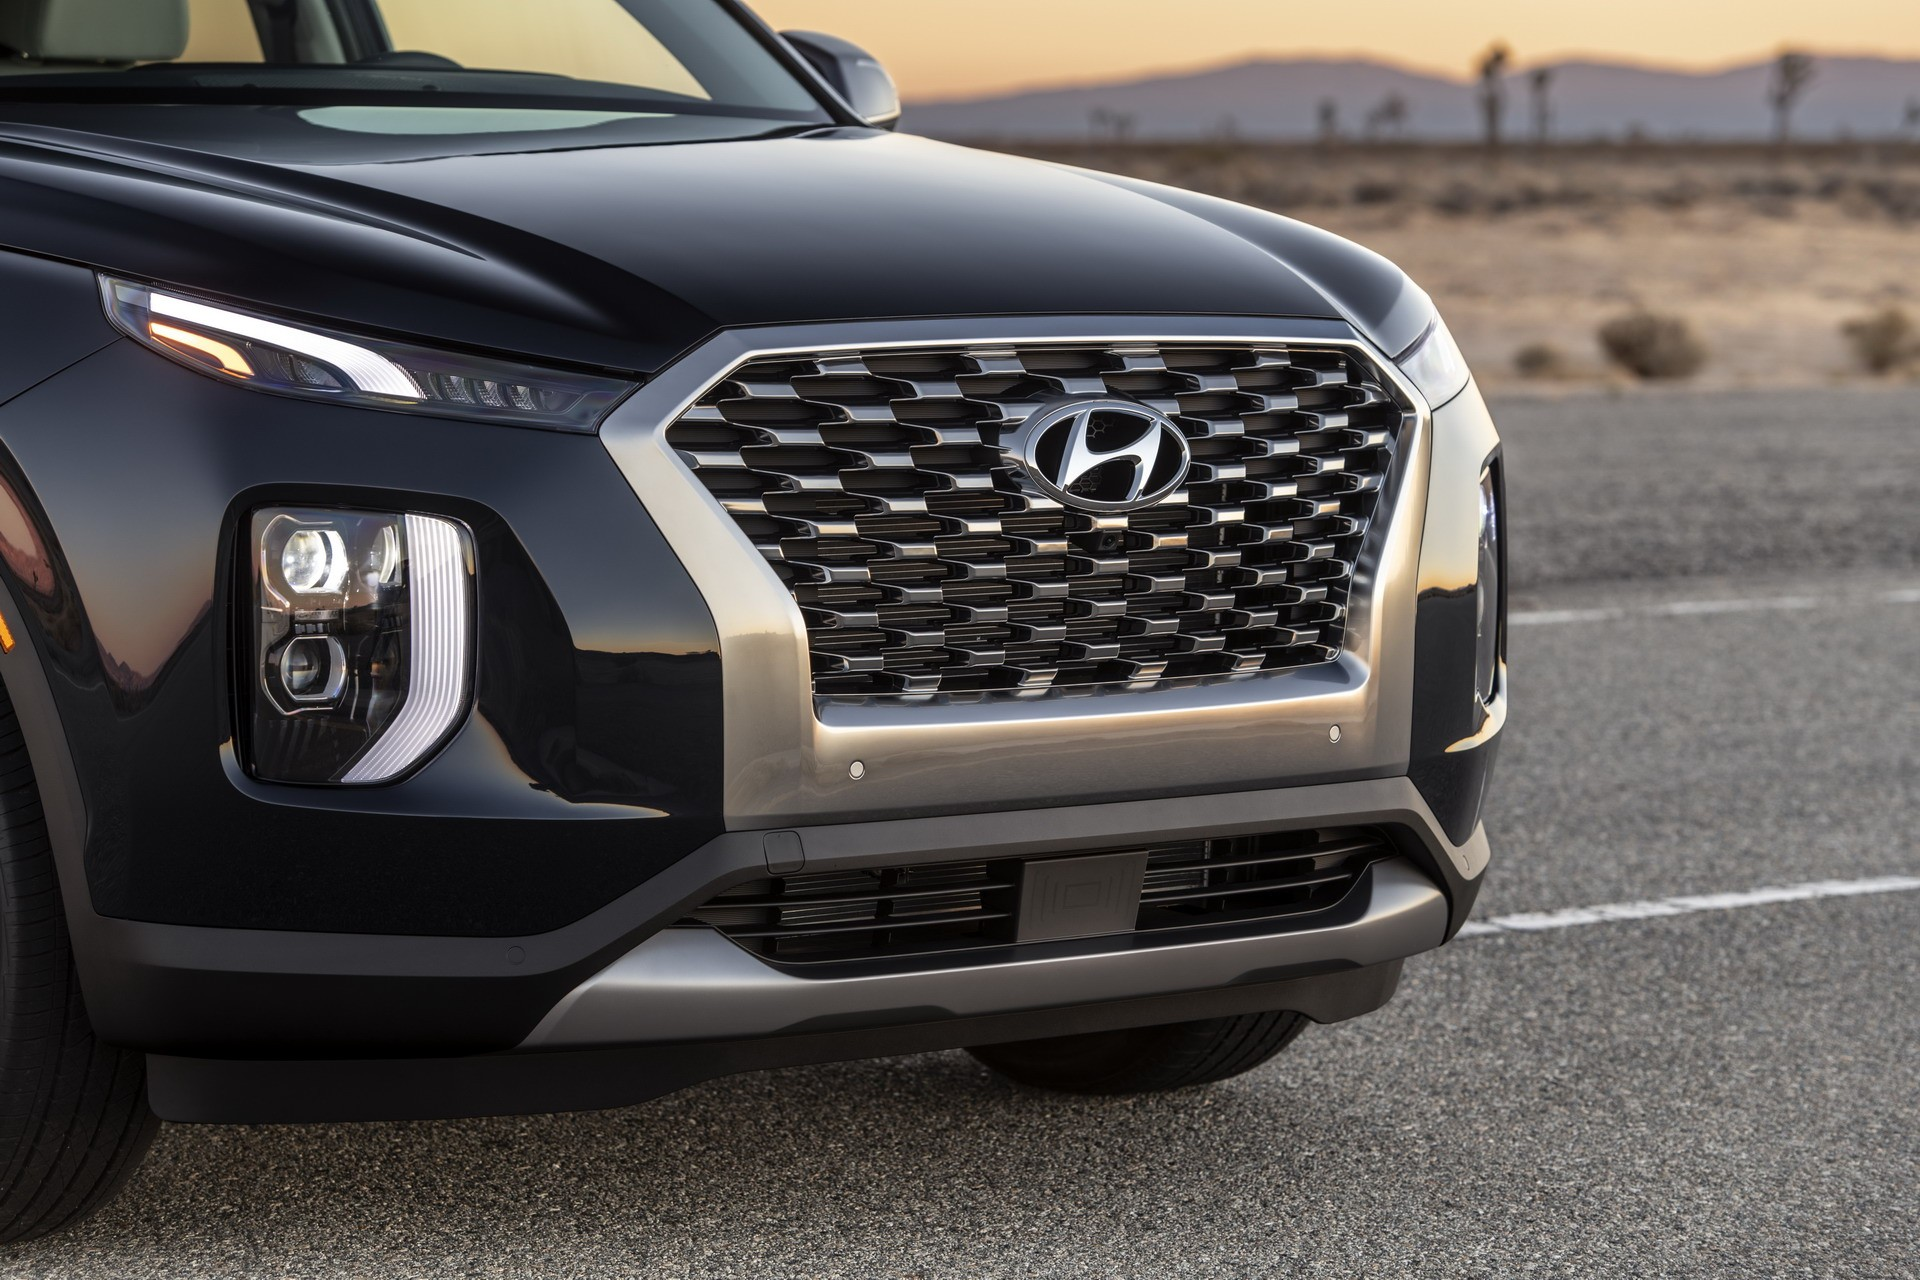 2020 Hyundai Palisade Oozes 8-Seat Crossover Luxury ...